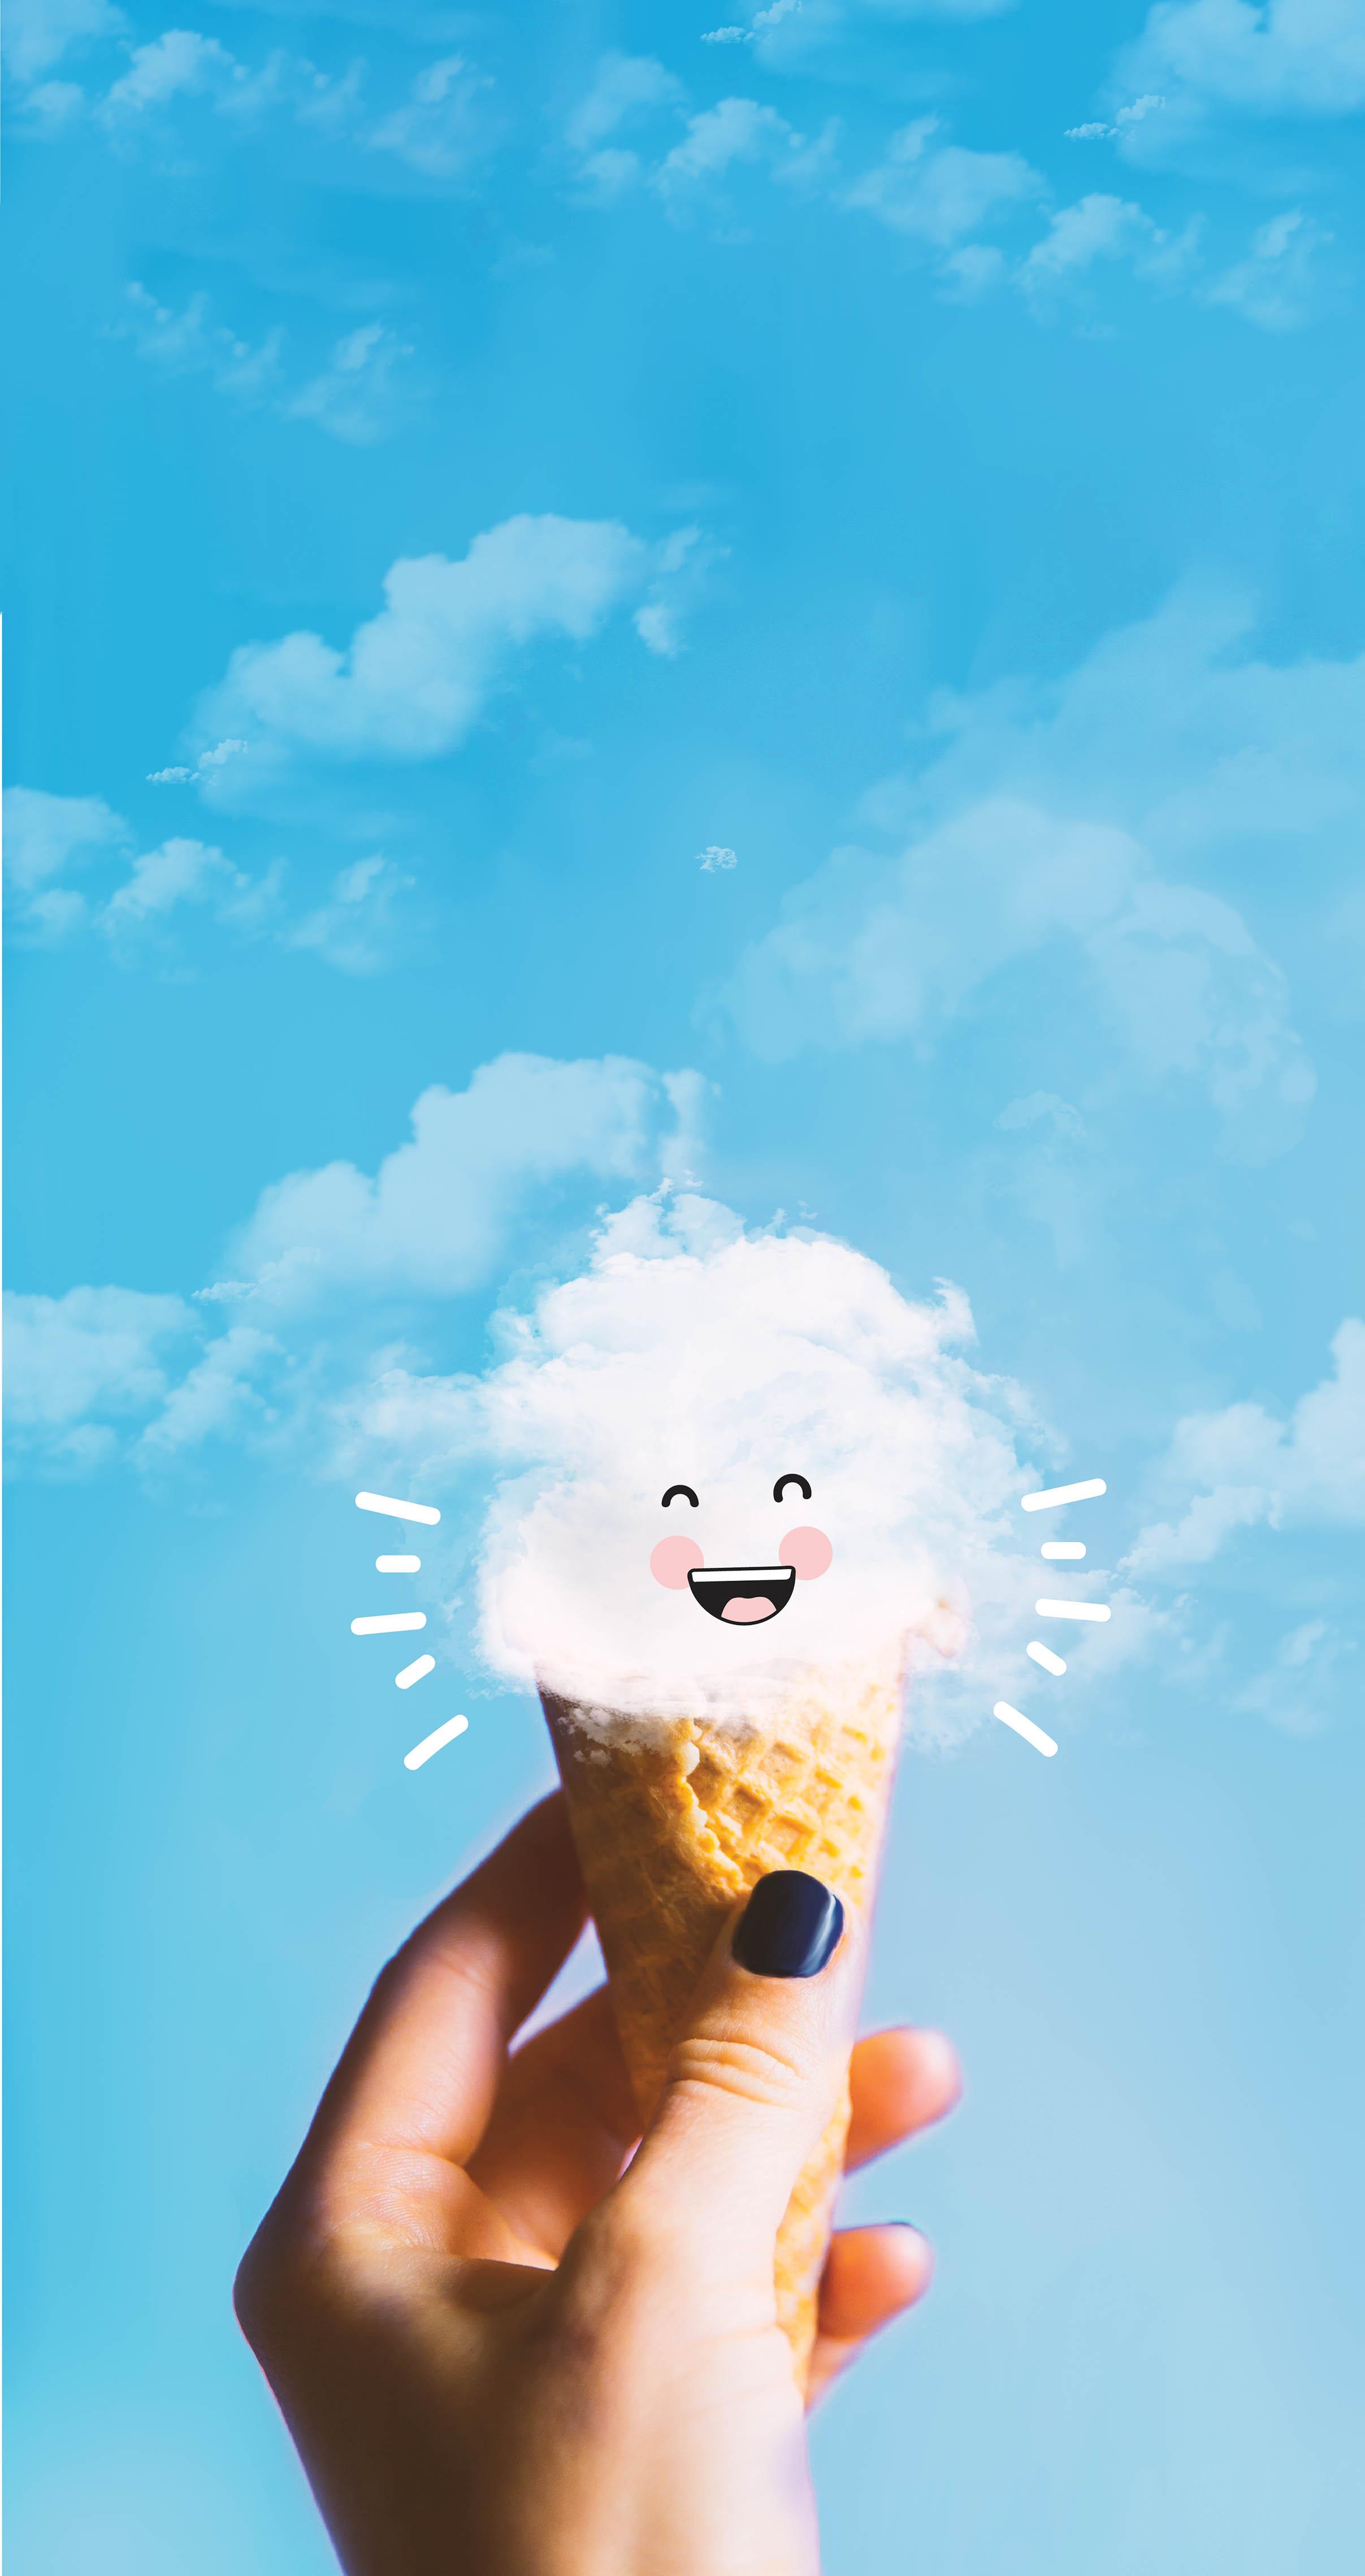 wallpaper-movil-helado